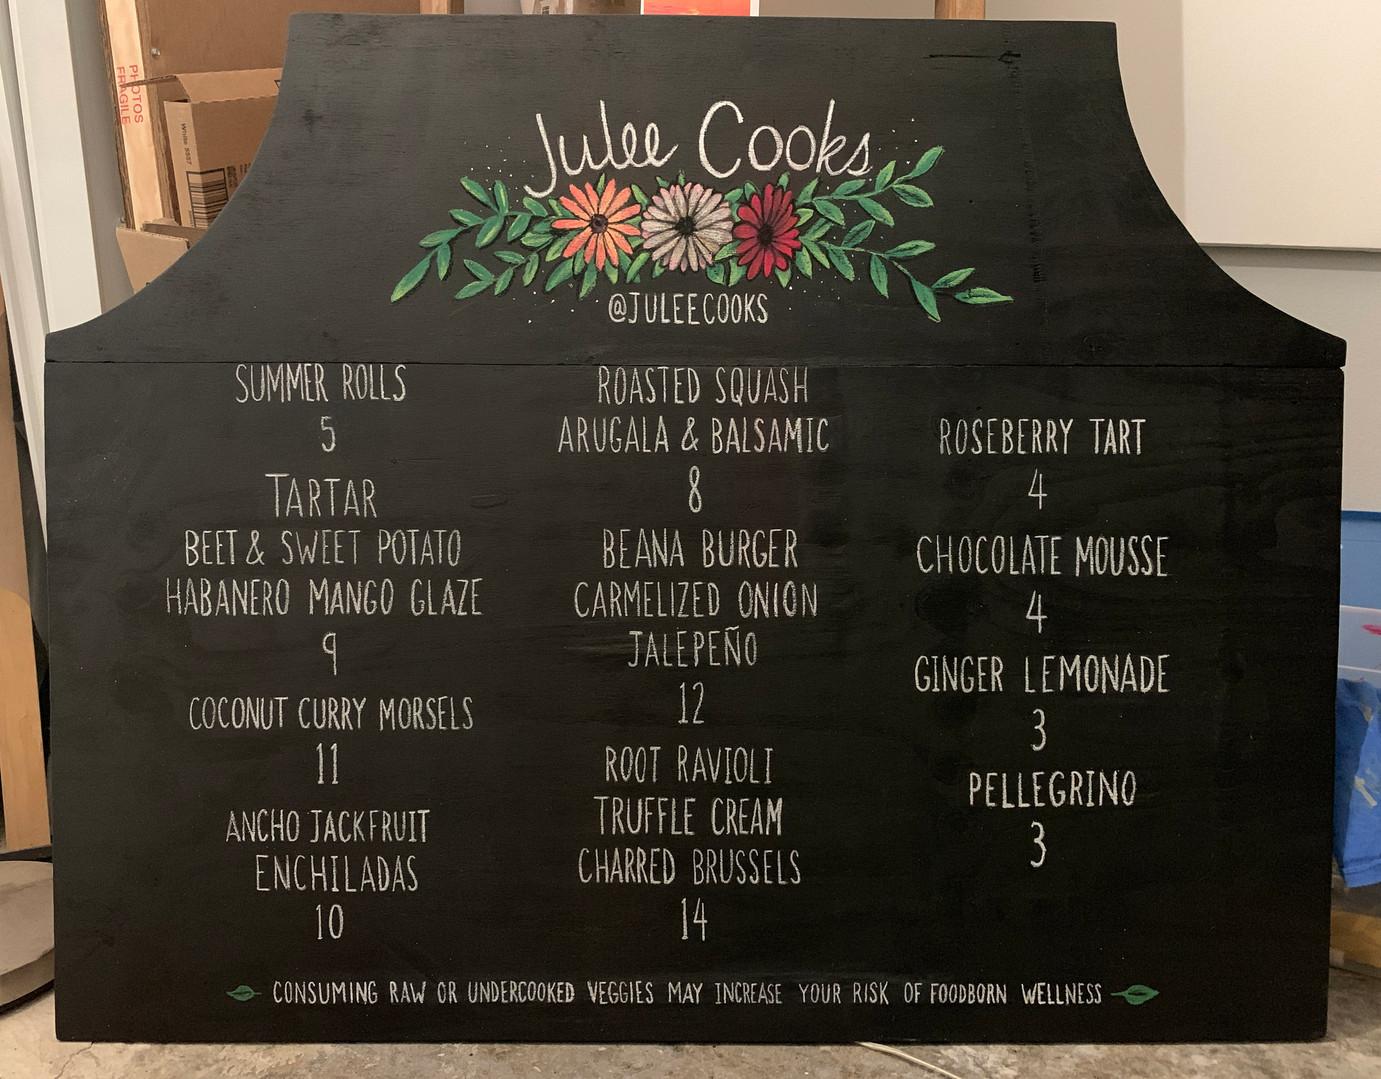 Julee Cooks menu